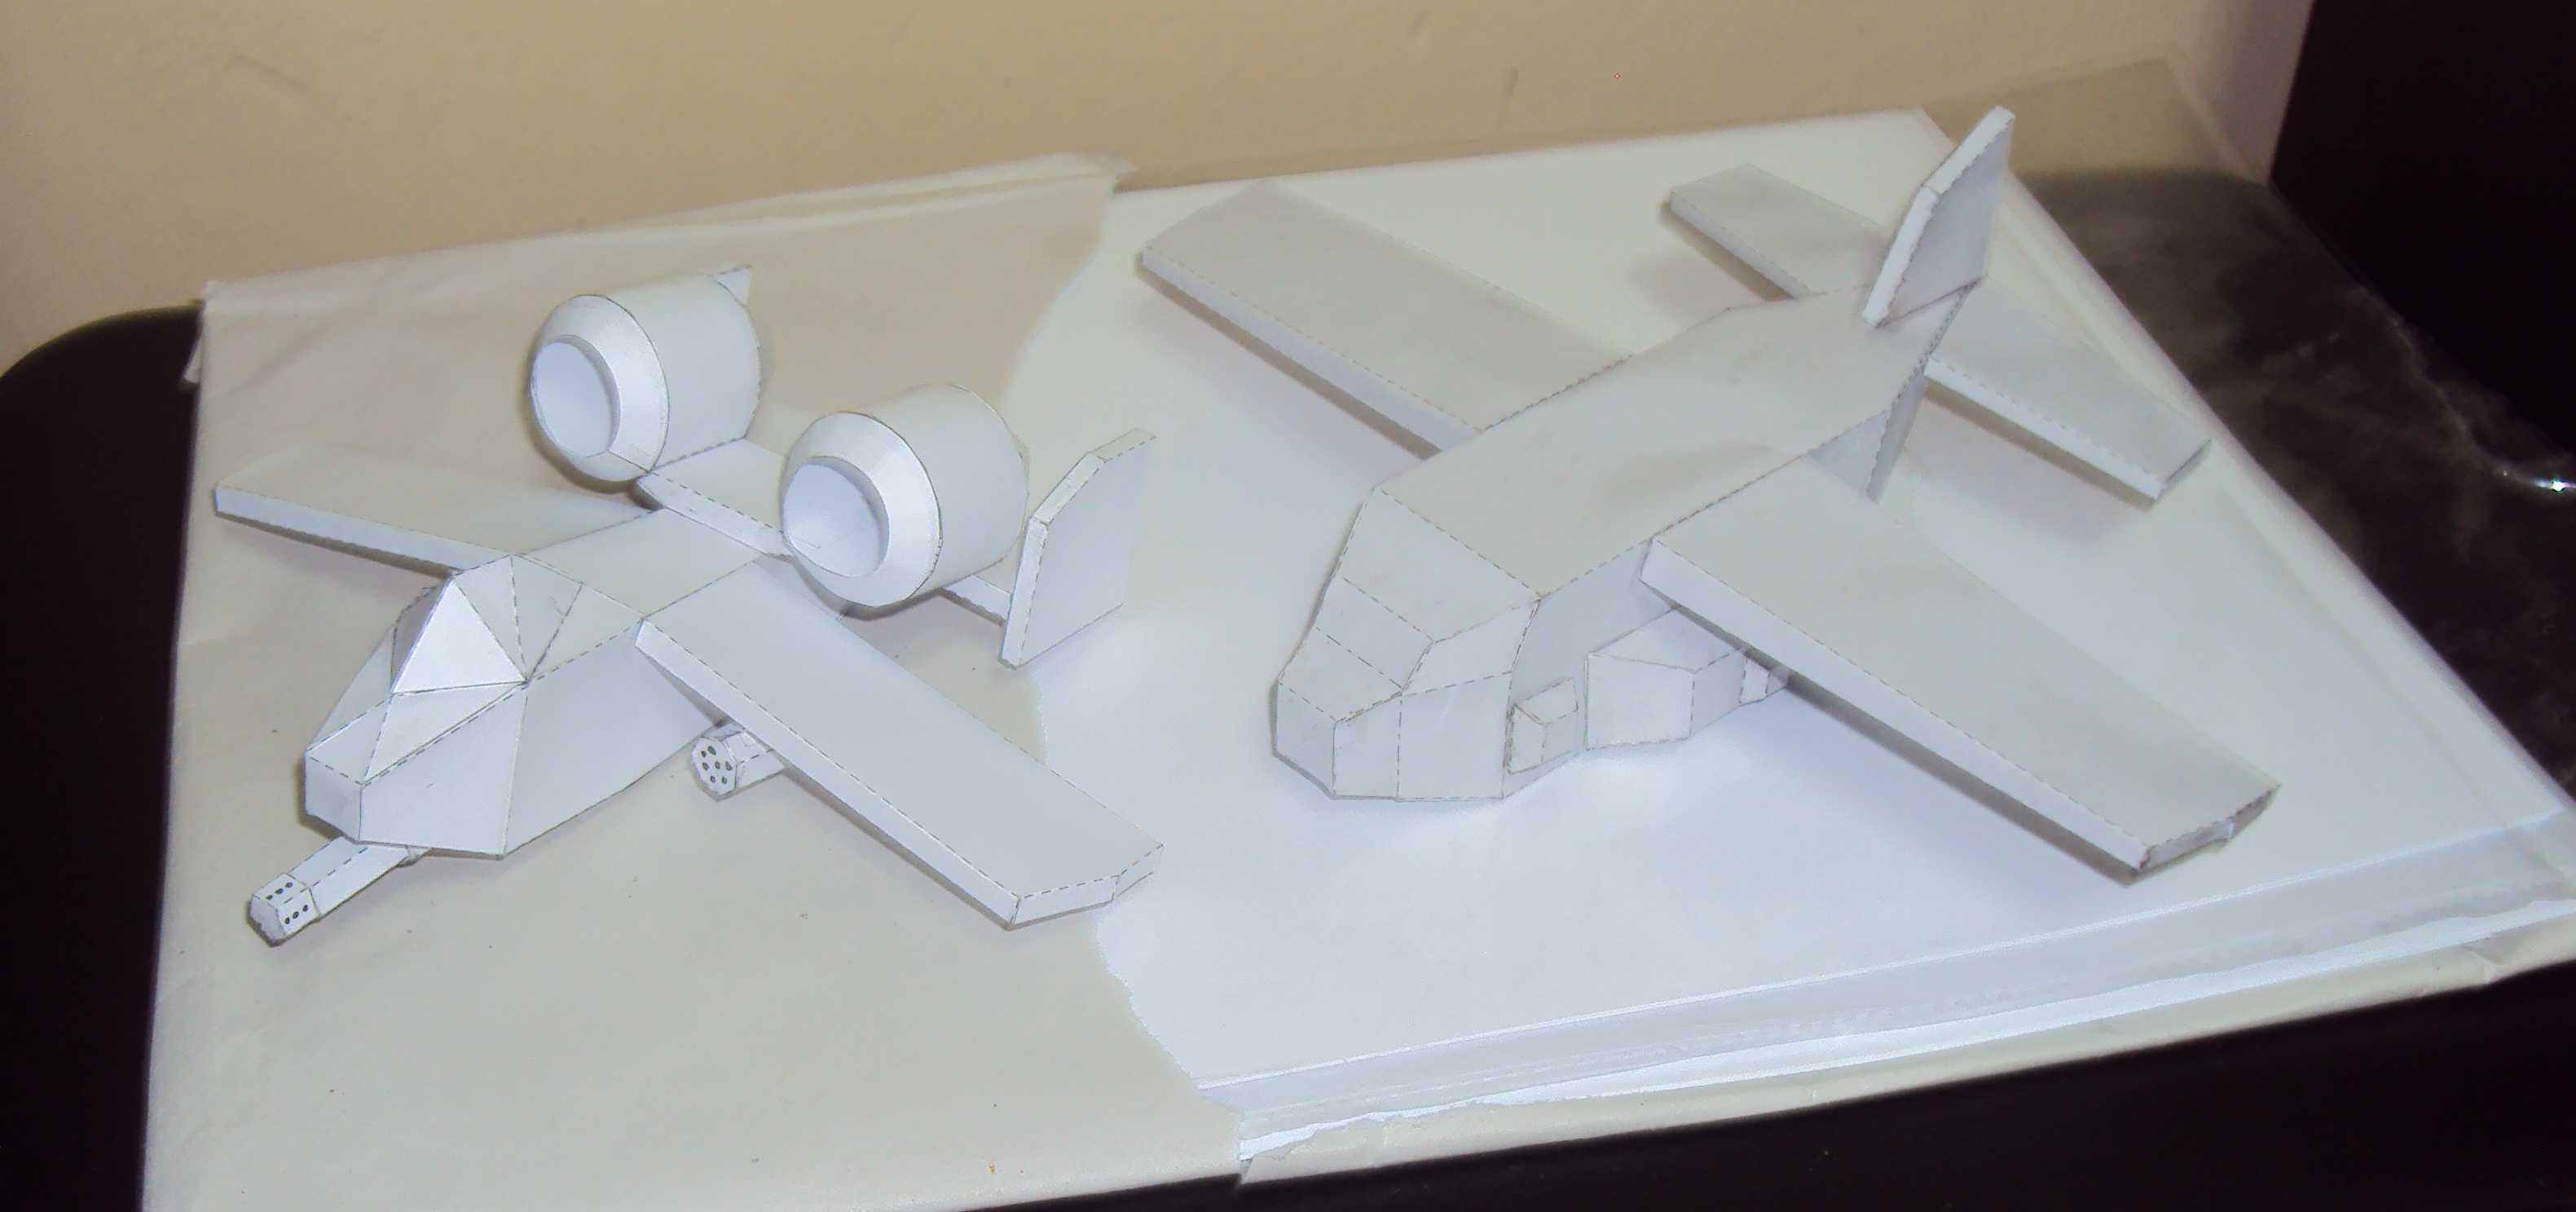 A-10 Thunderbolt y Ac-130 Spectre Gunship